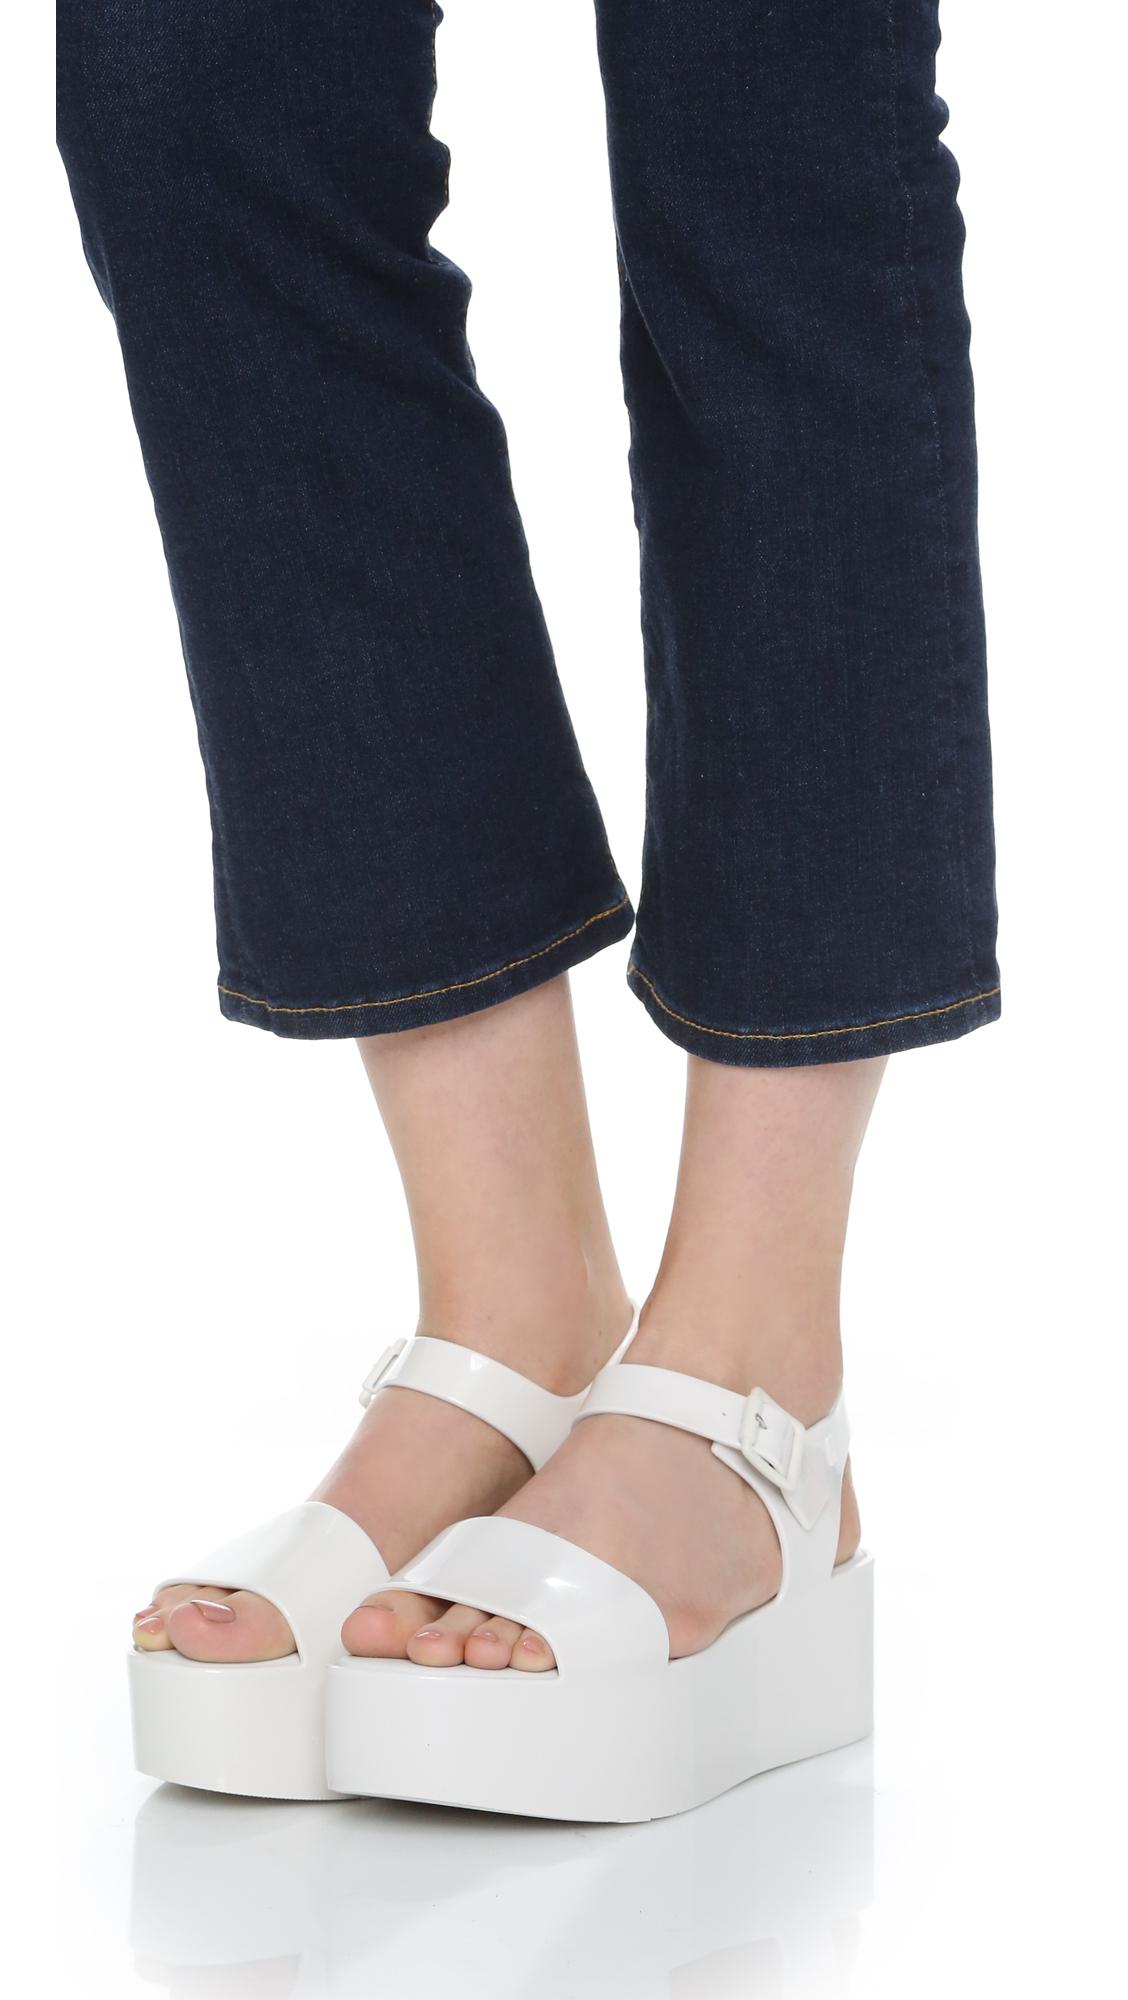 c1a120fdb552 Melissa Mar Flatform Sandals